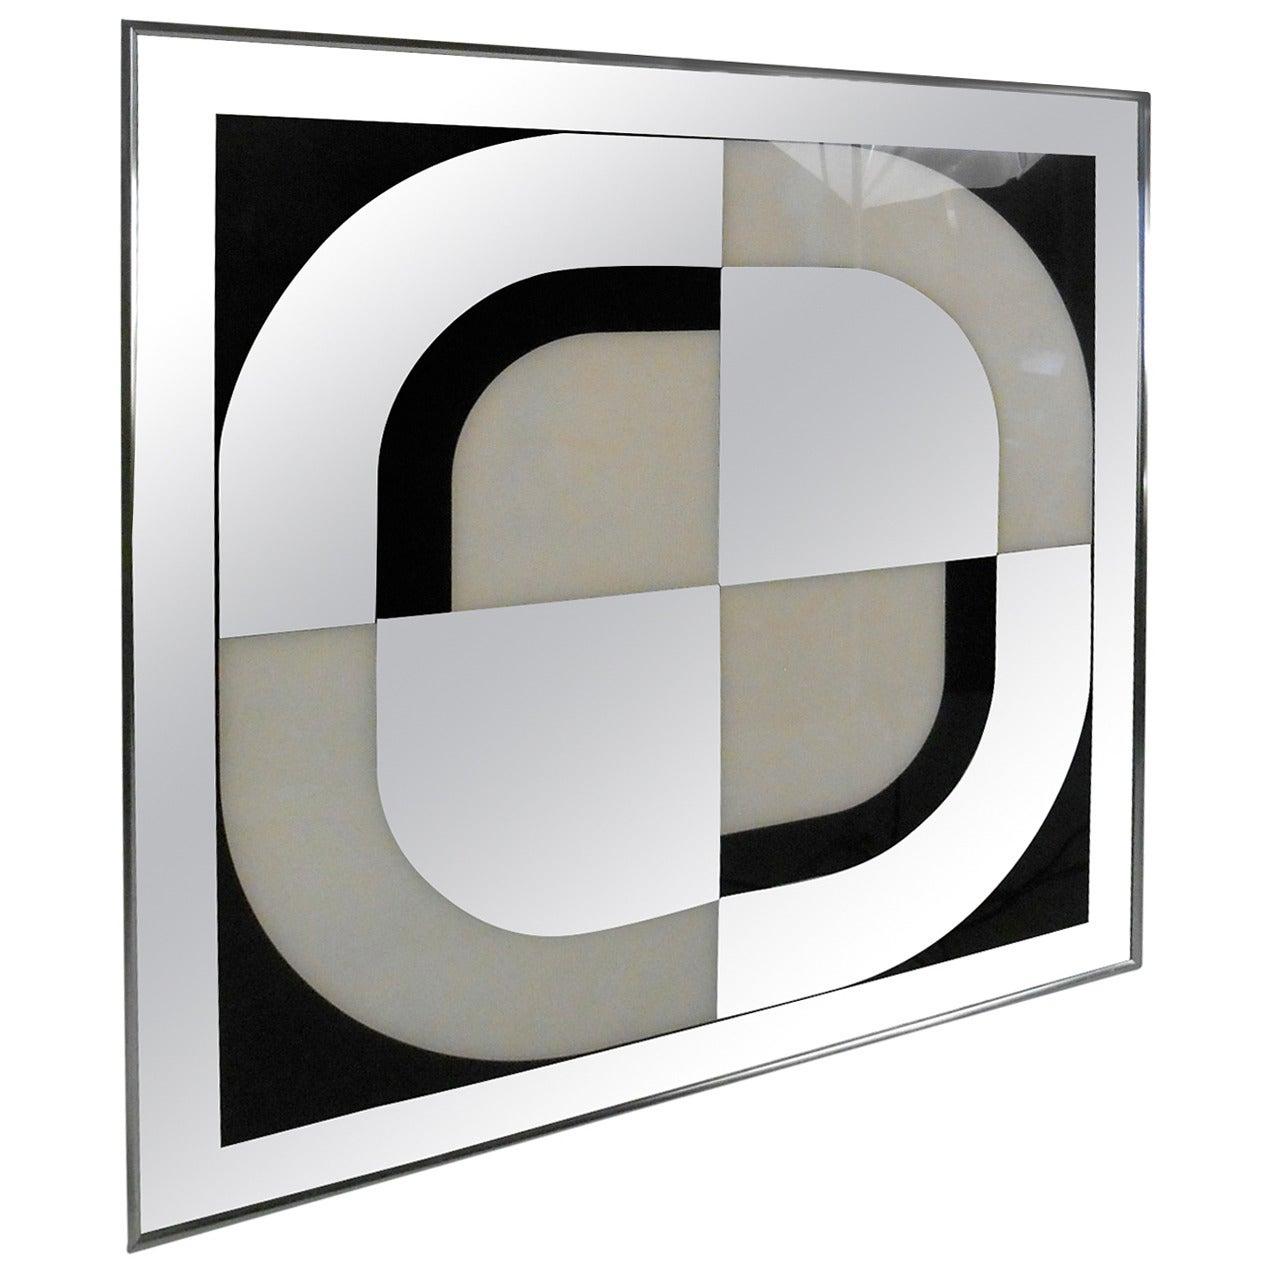 Unique Mid-Century Modern Mirrored Wall Art by Turner Design